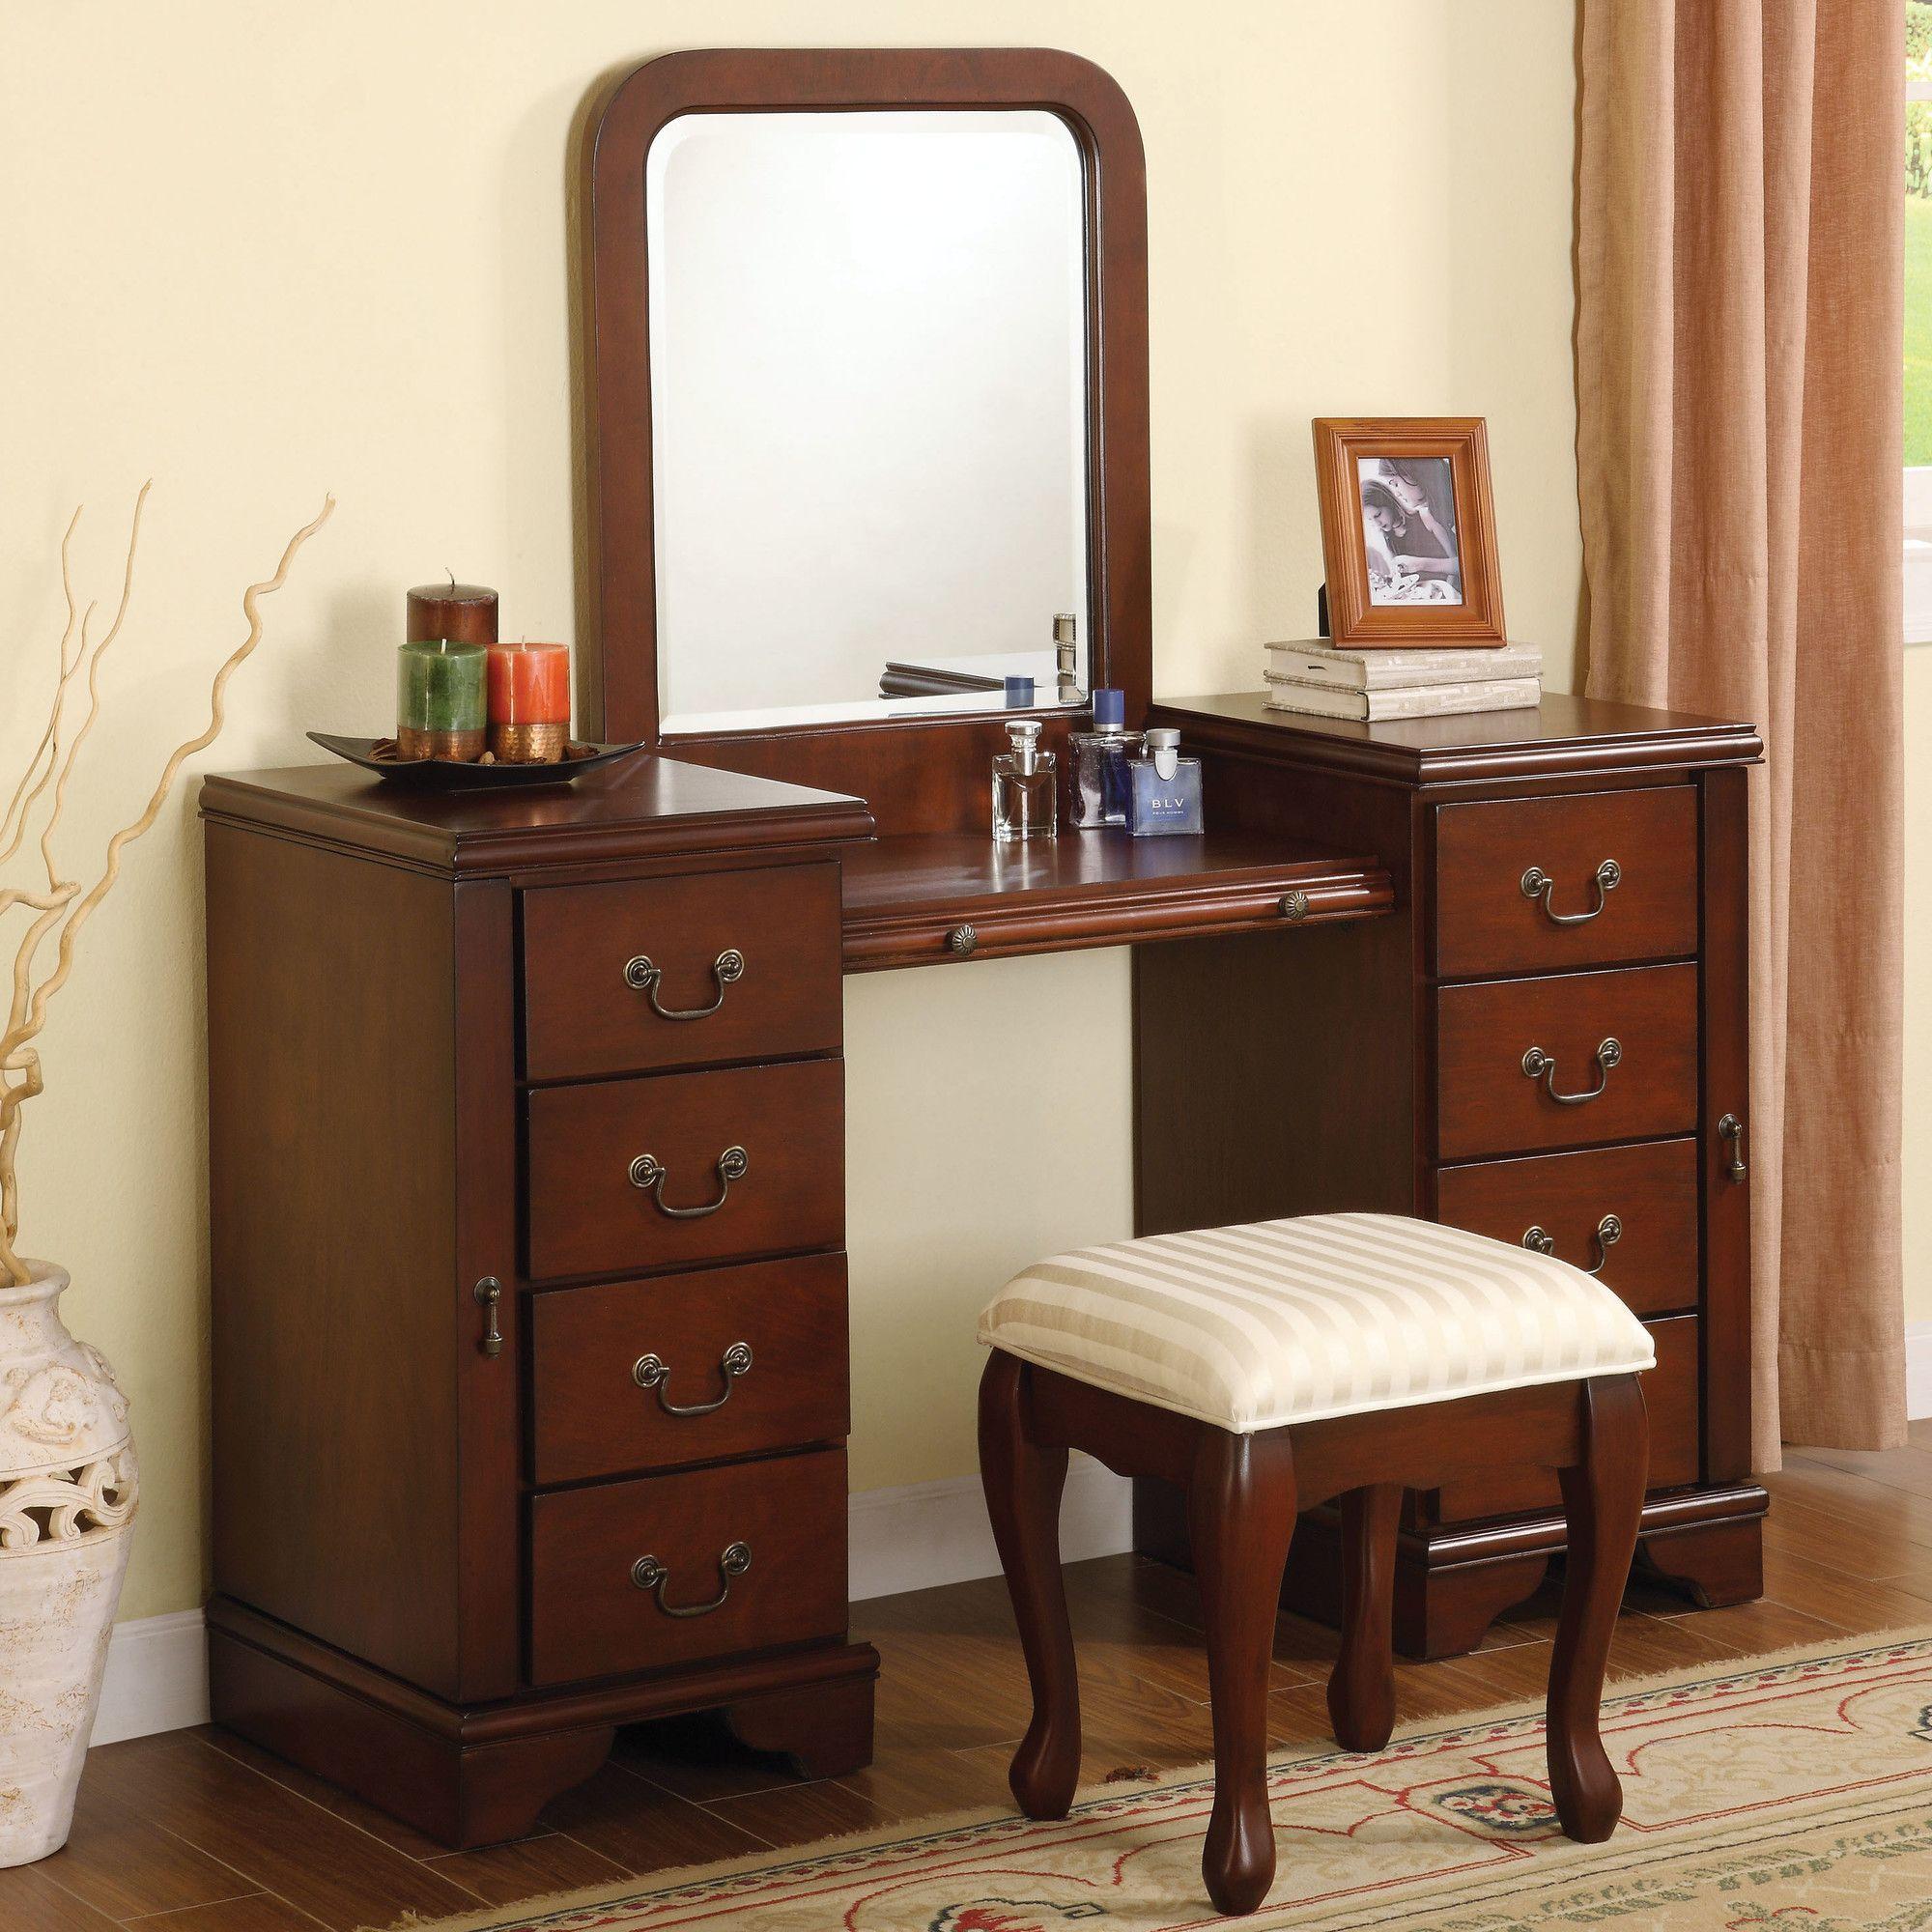 Louis phillipe vanity set with mirror wayfair furniture